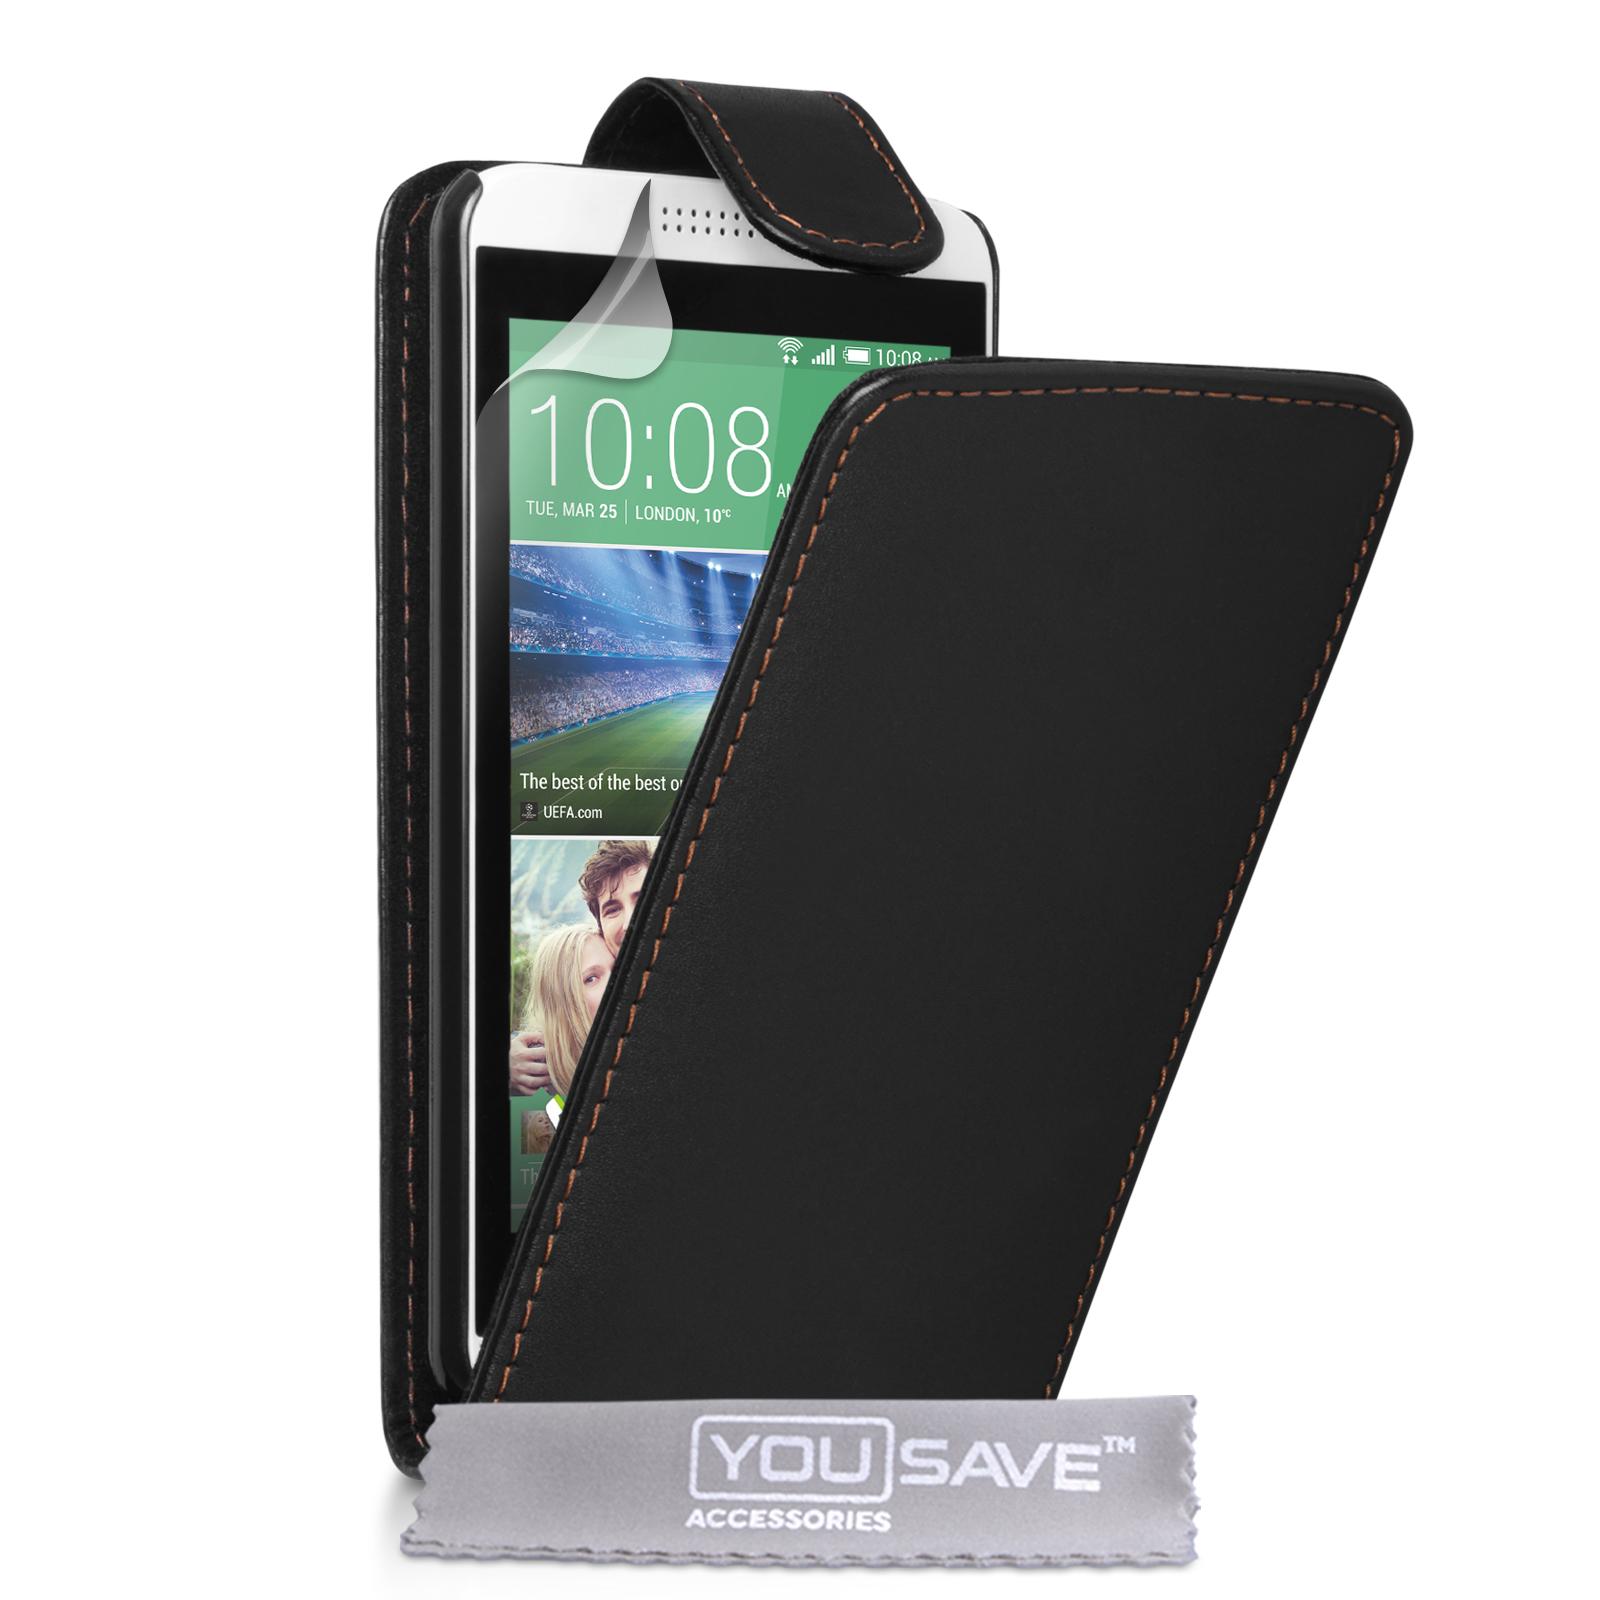 Flip Θήκη HTC Desire 610 by YouSave (Z443)